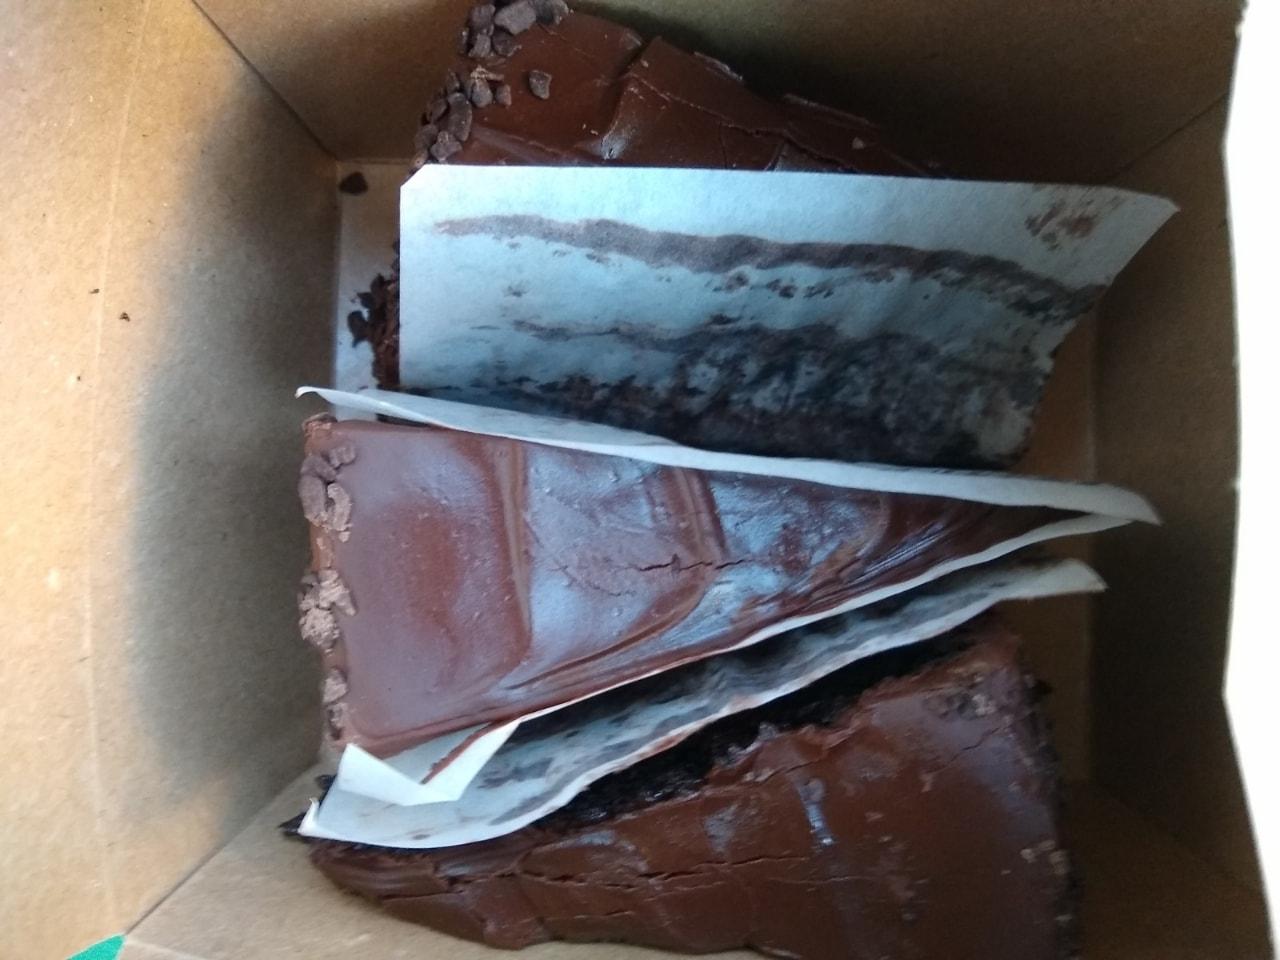 A few cakes